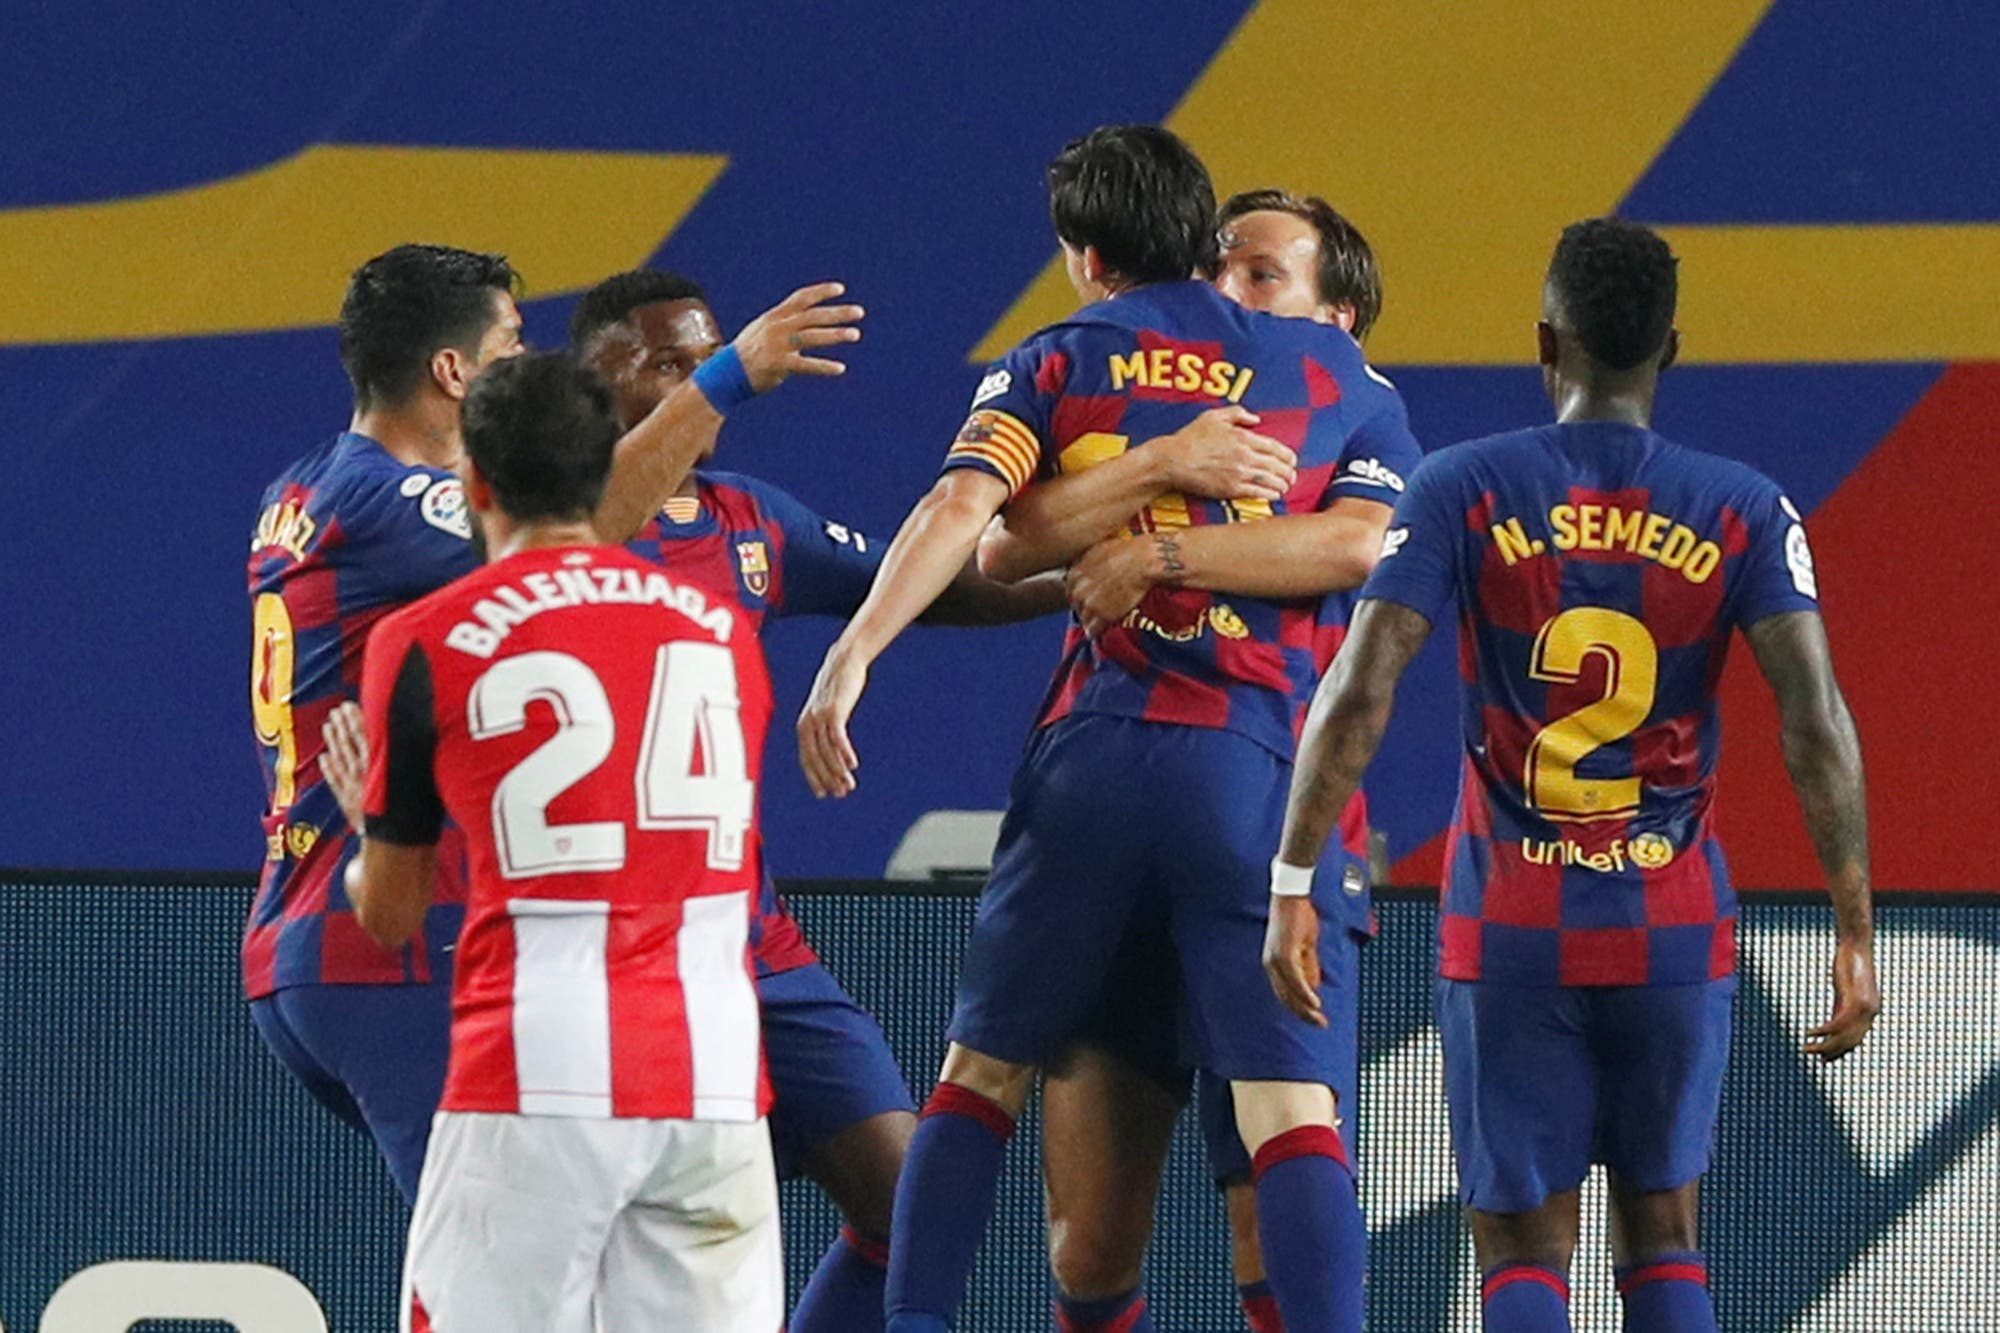 No llega el gol 700 de Lionel Messi, pero igual festejó: Barcelona le ganó un partido clave a Athletic Bilbao